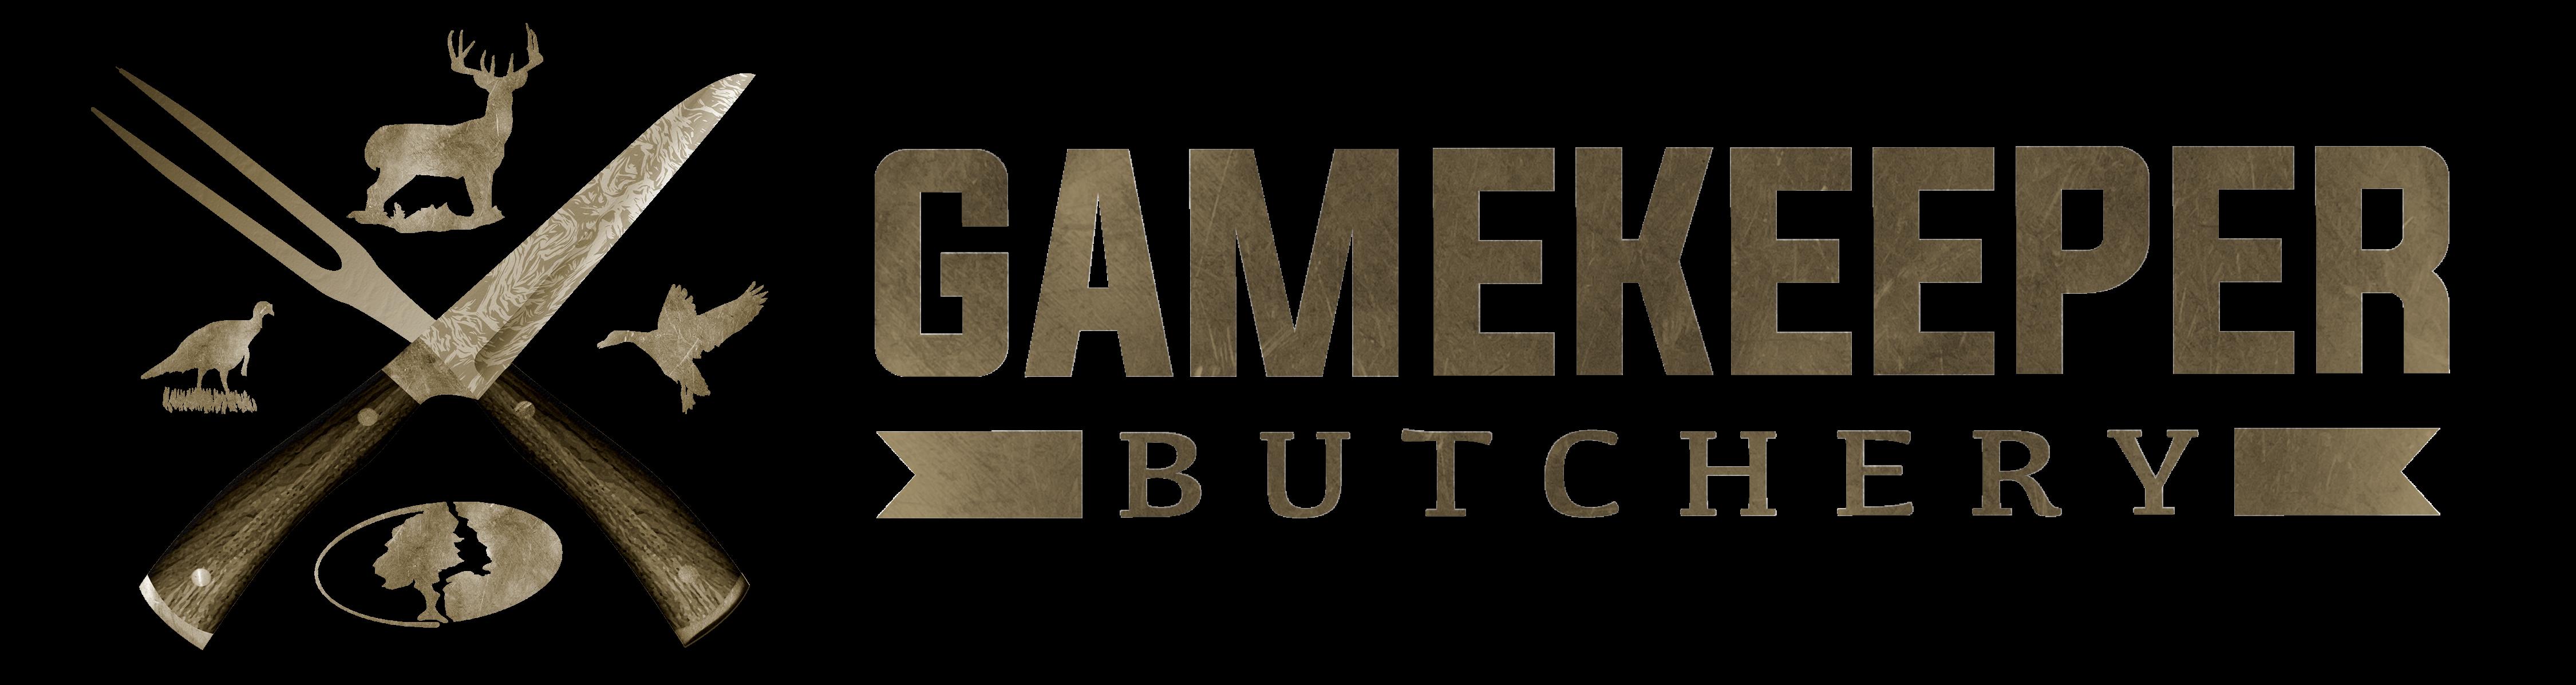 Gamekeeper Butchery Blog